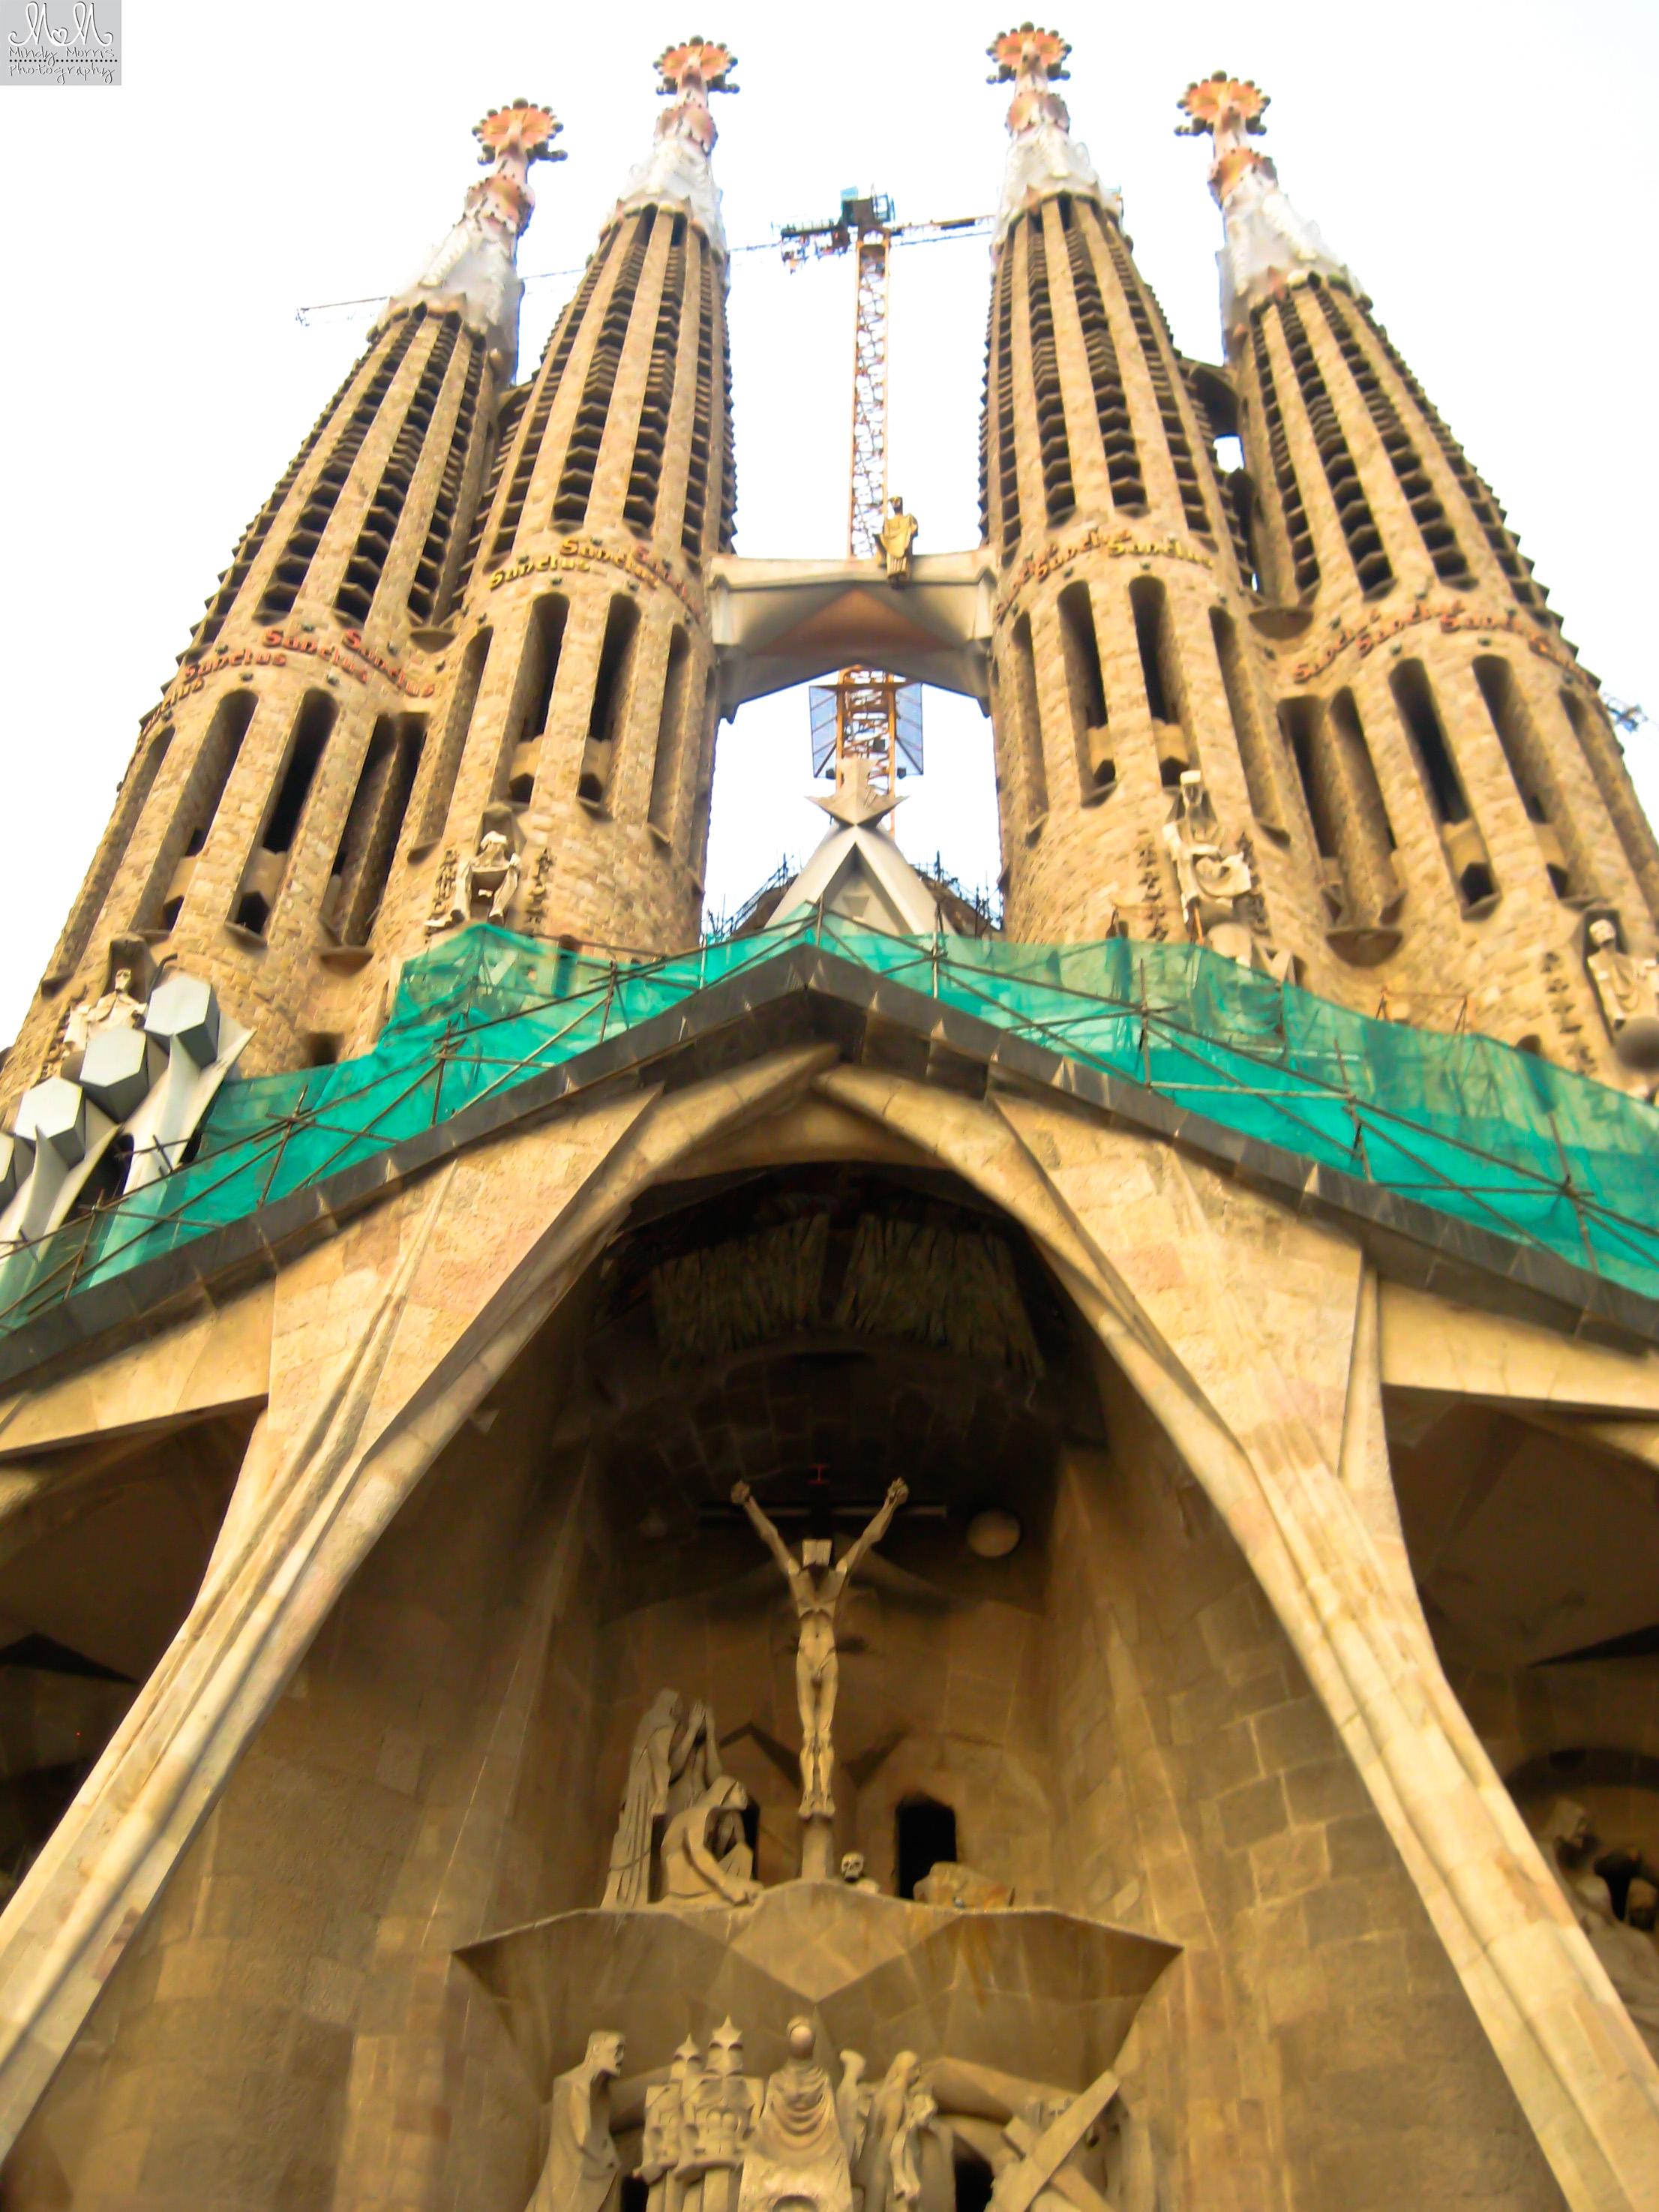 Sagrada Familia, Barcelona, Gaudi